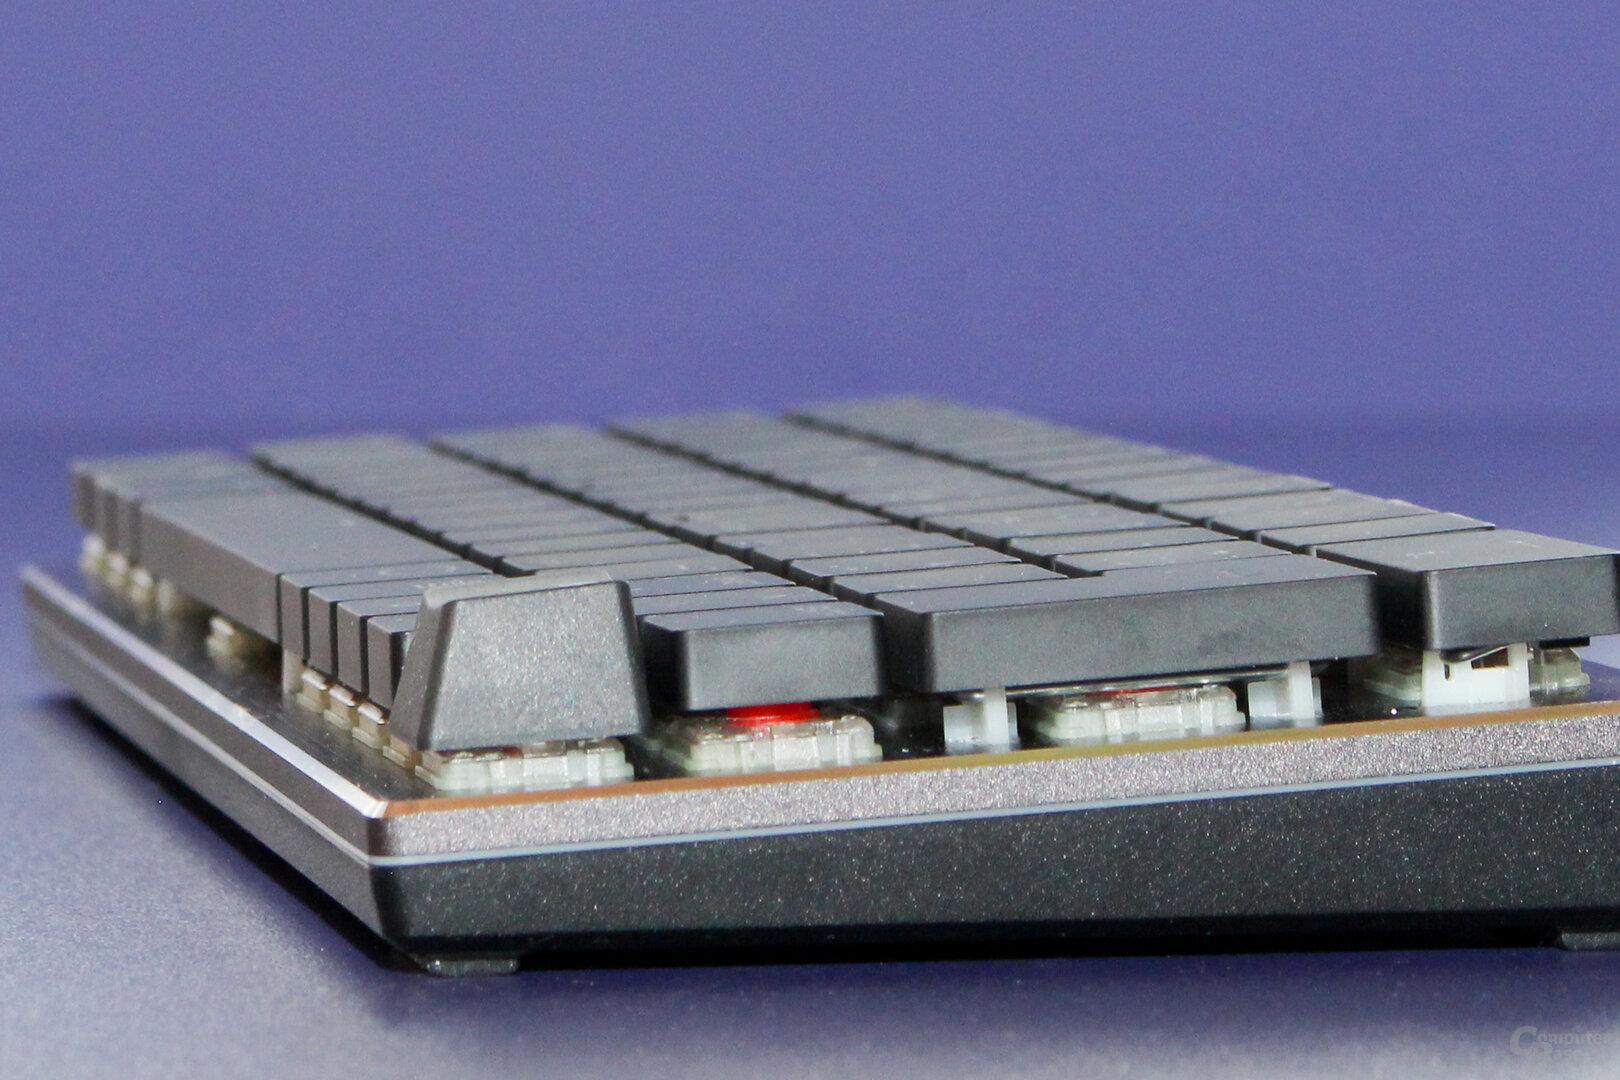 Cooler Master nutzt besonders flache Kappen auf den SK-Tastaturen